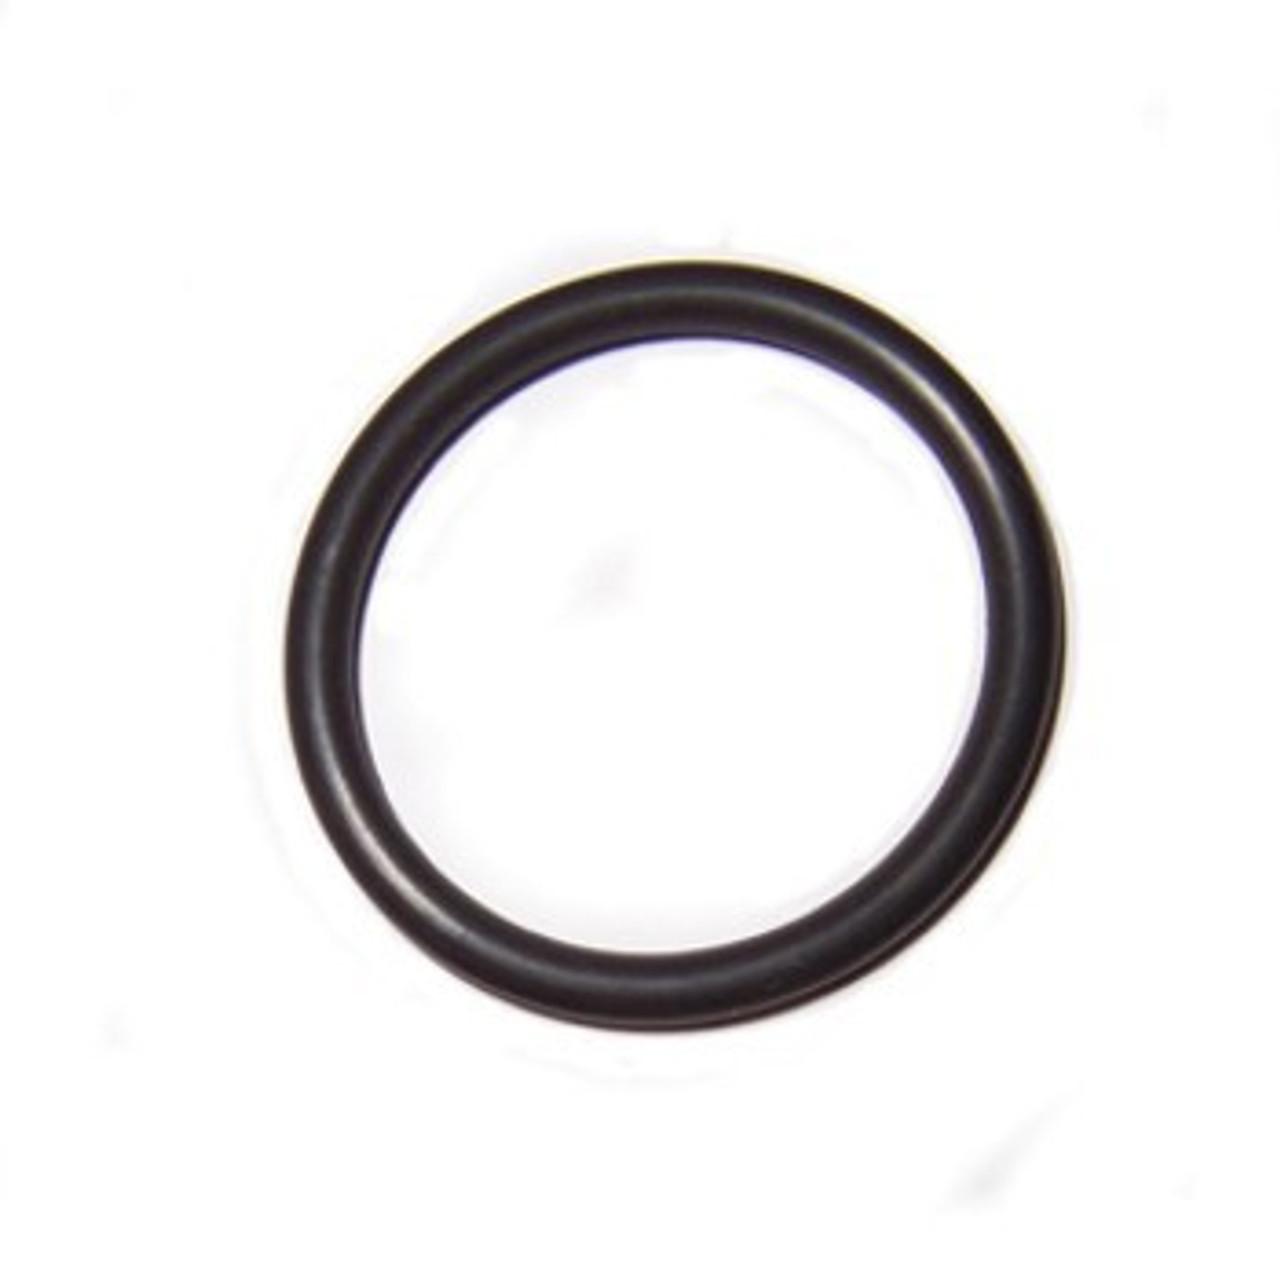 medium resolution of oil fill riser to valve cover o ring 94 07